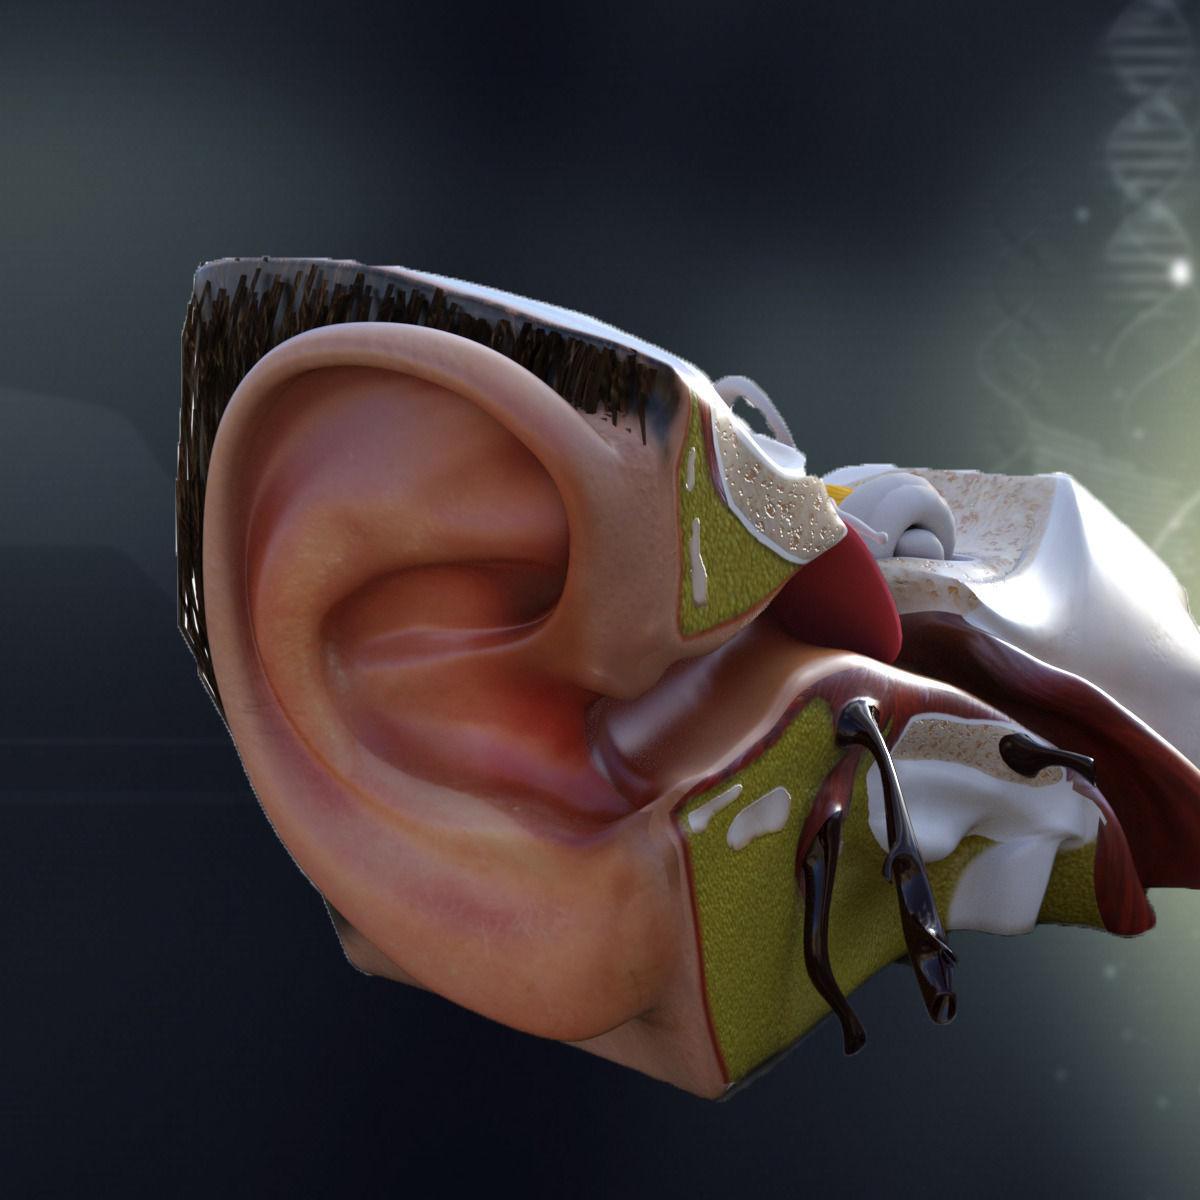 Human Ear Anatomy 3D model | CGTrader